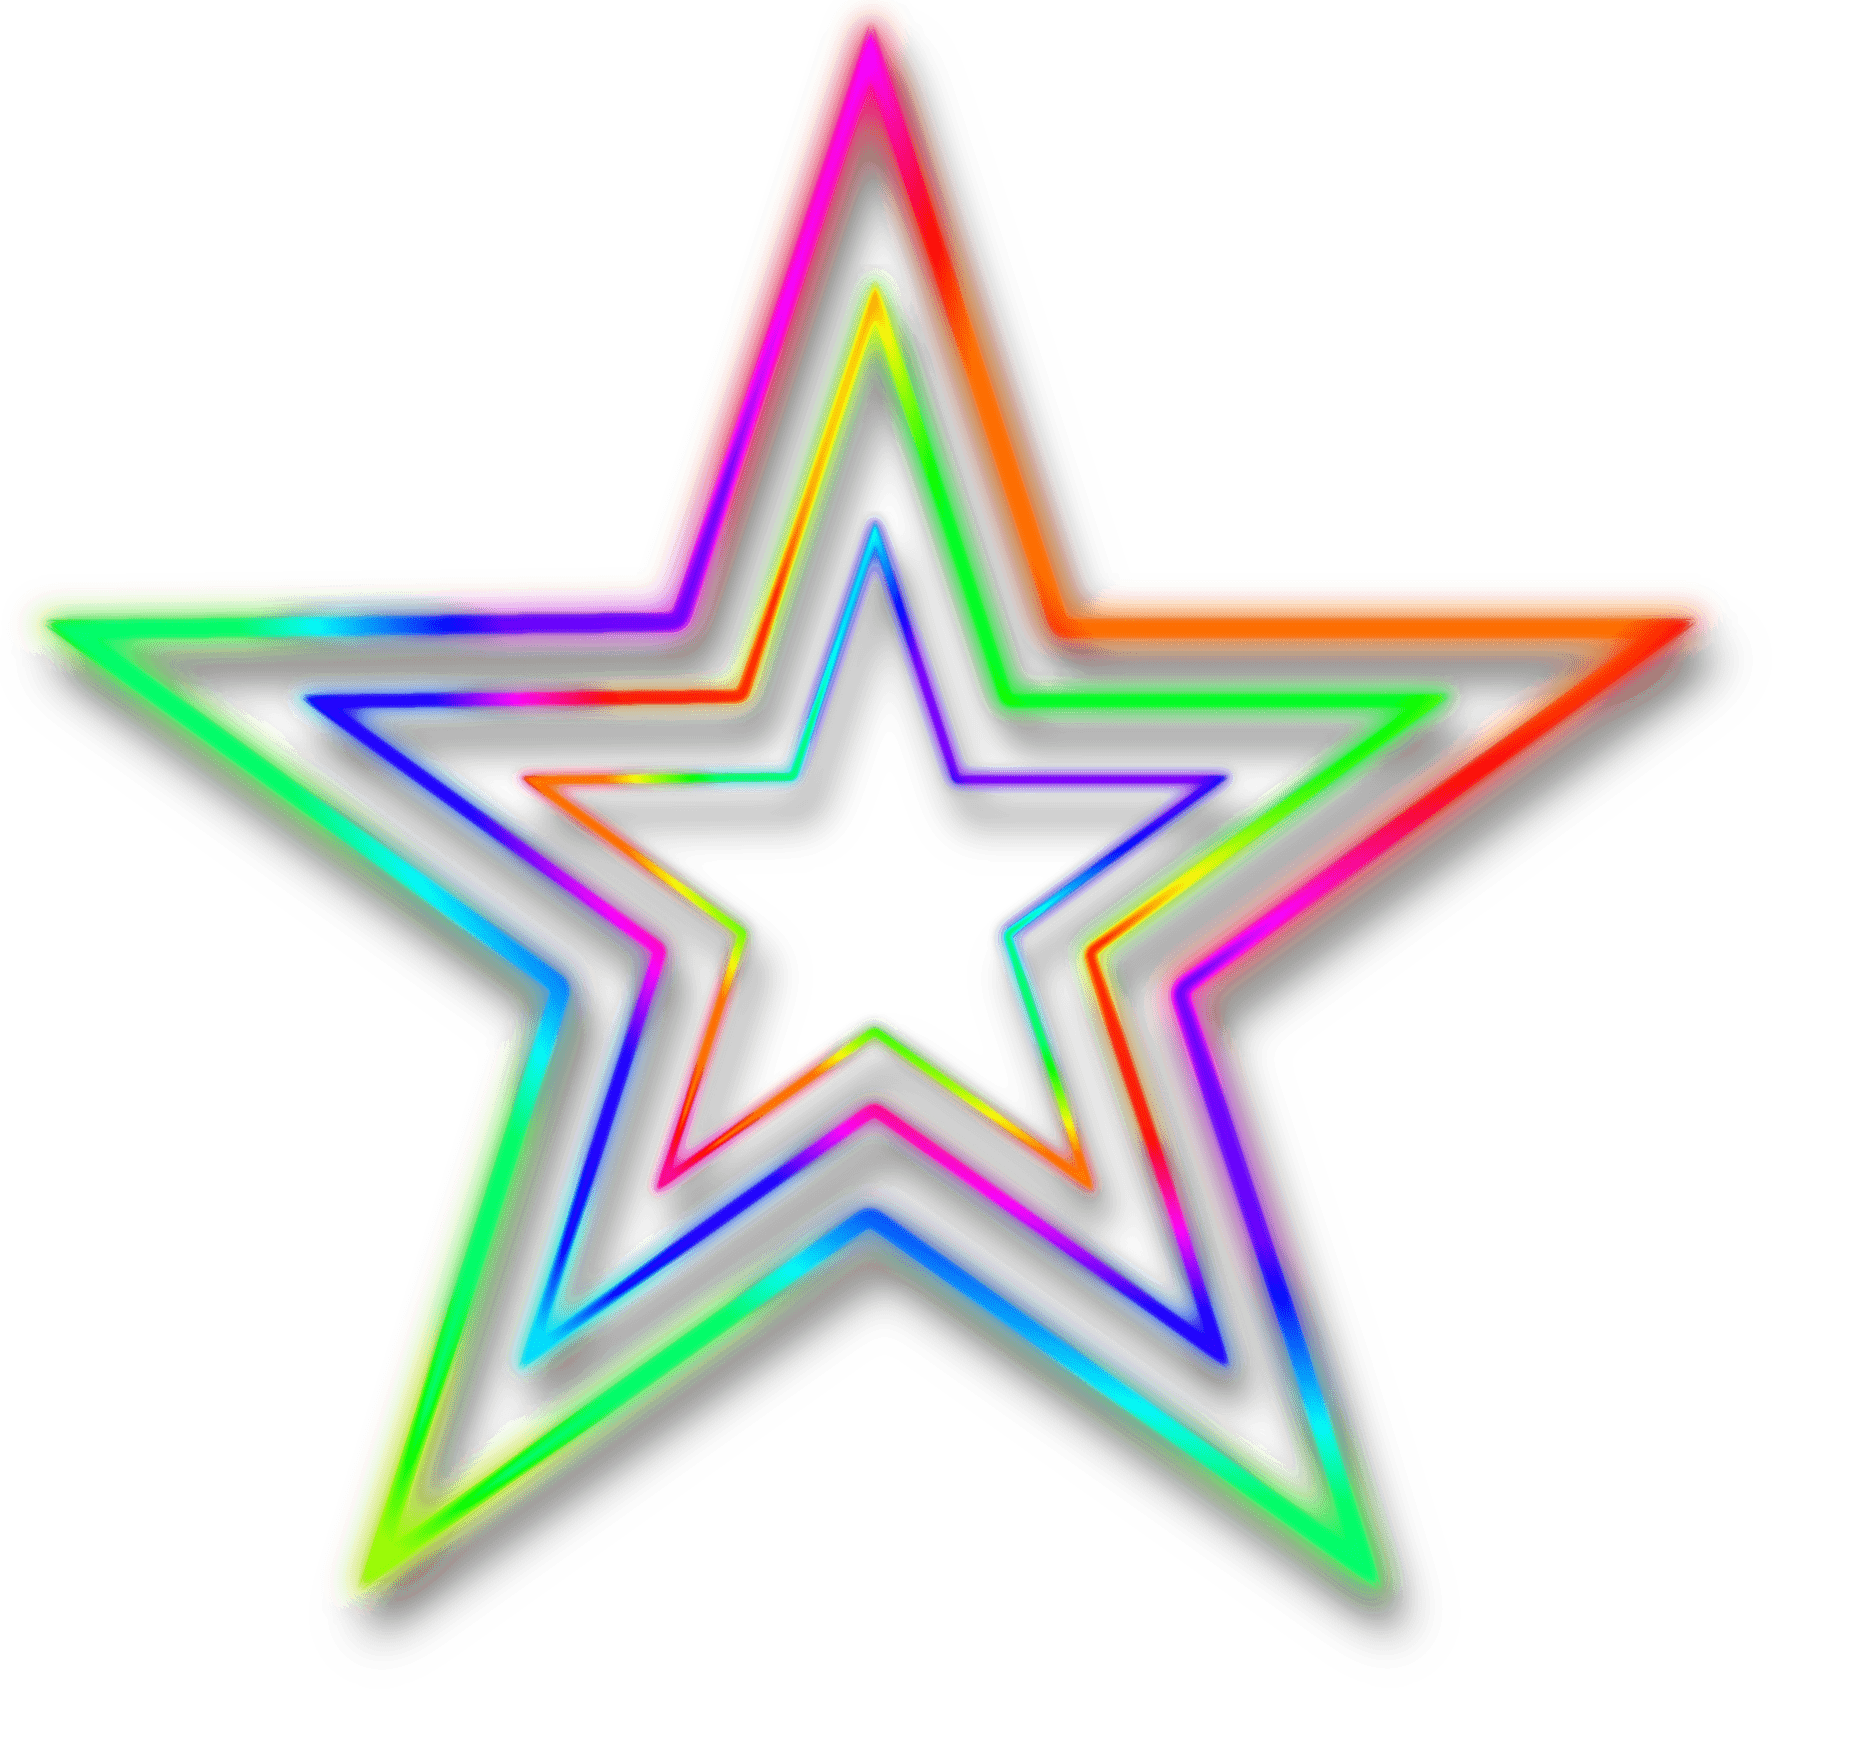 Neon Star Transparent Background - HD Wallpaper